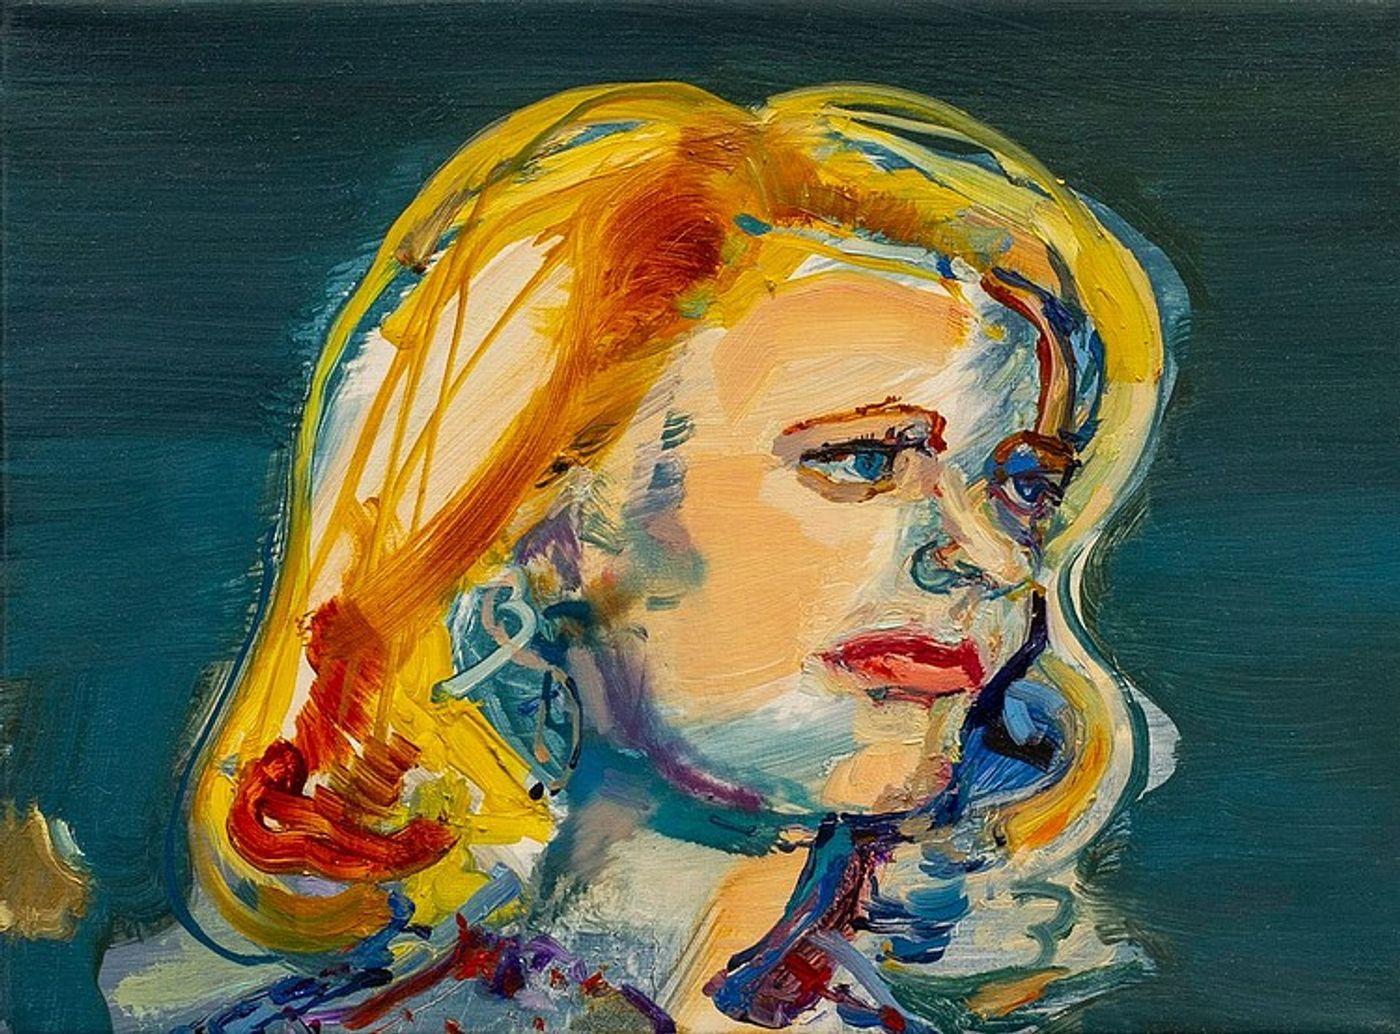 Angela Dufresne, Gena Rowlands, 2019. Oil on canvas, 9 x 12 in (23 x 30.5 cm).